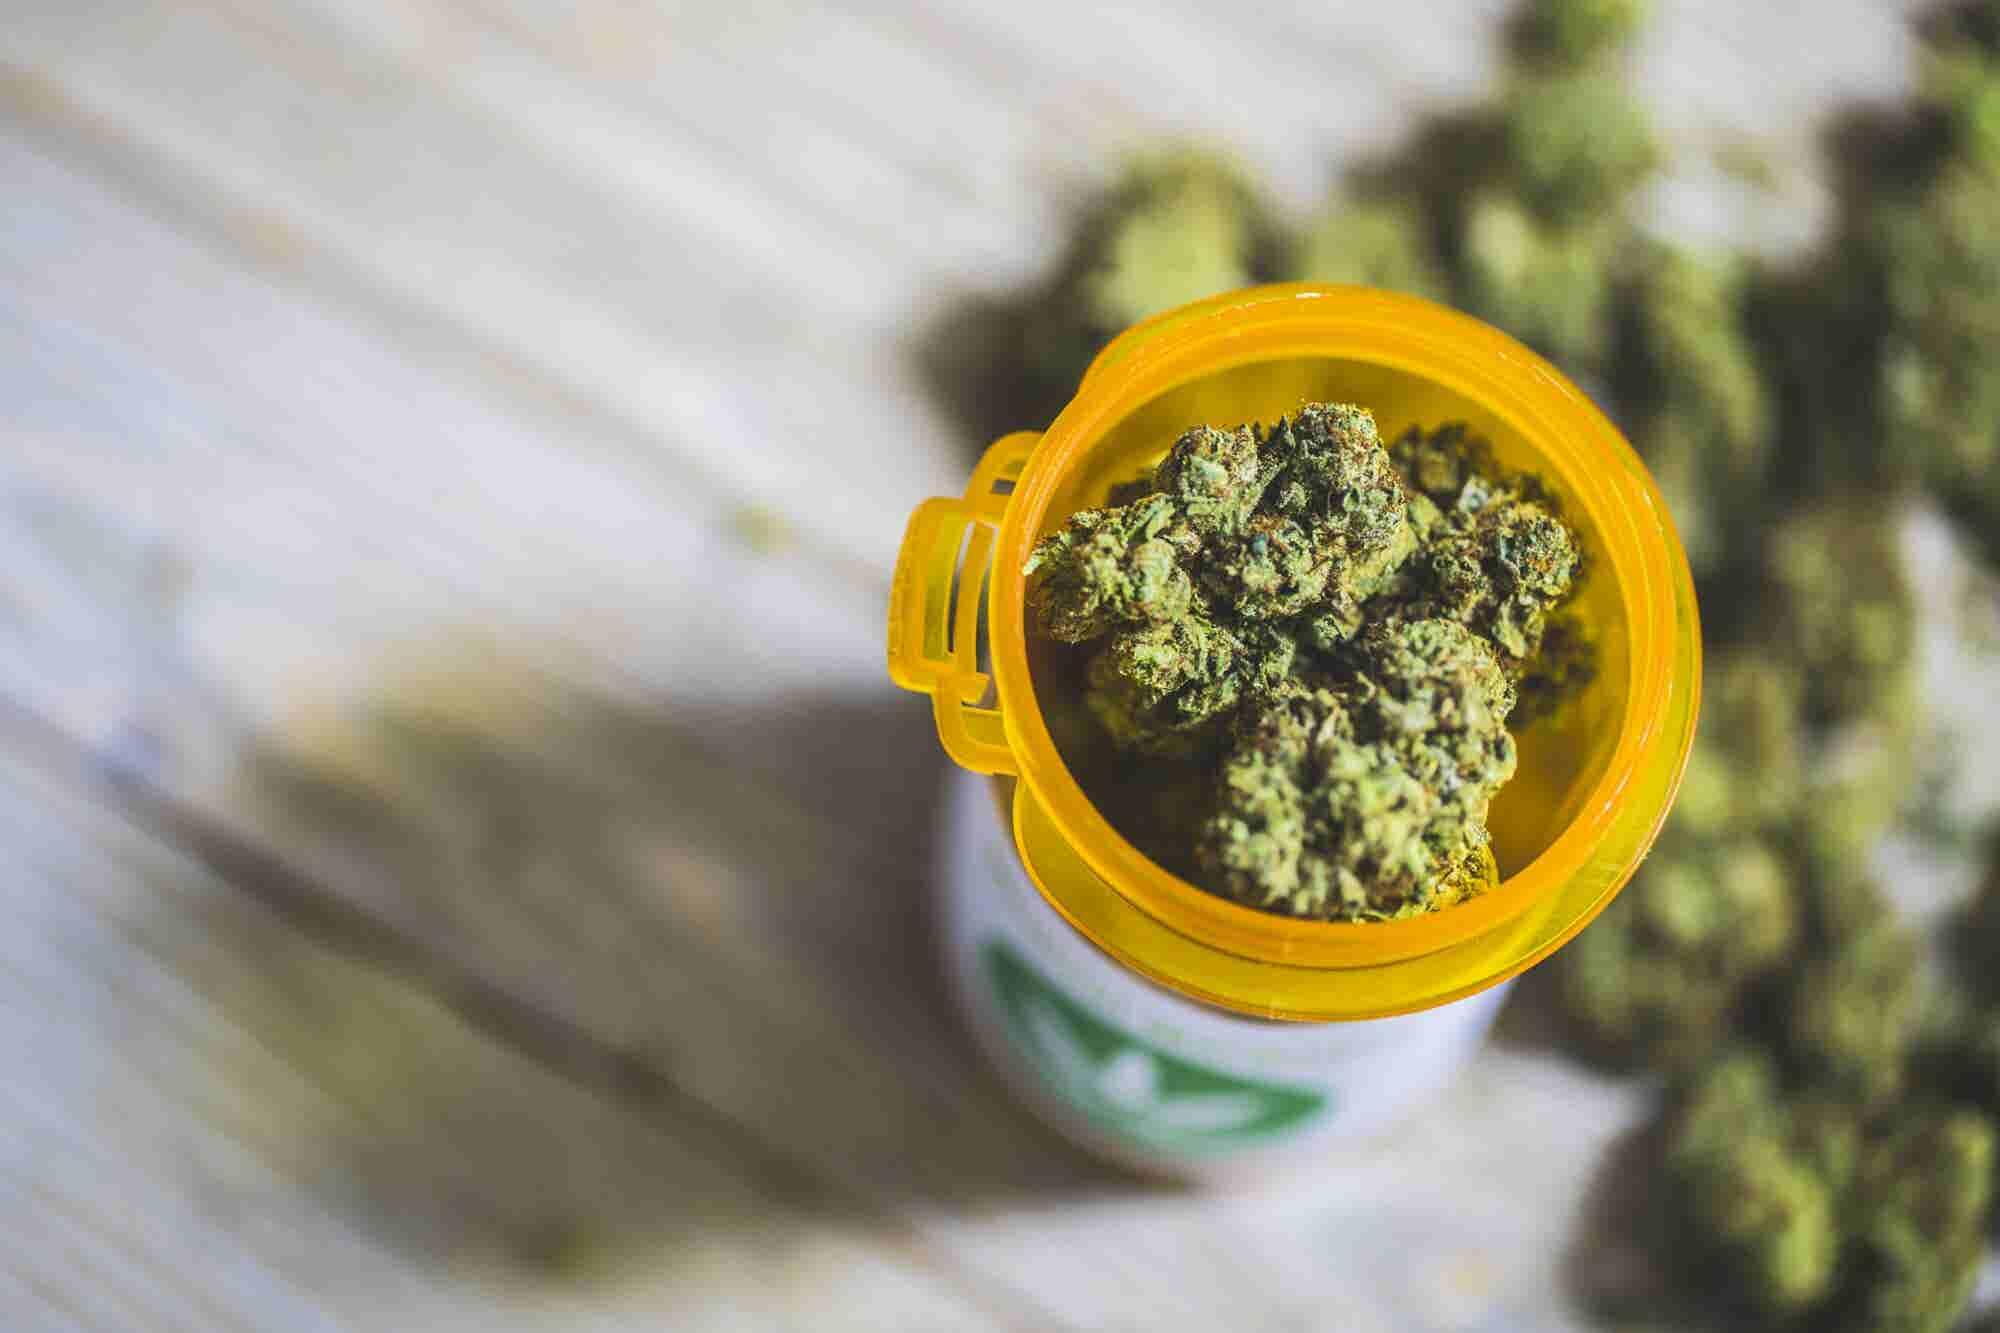 Congress May at Last Allow VA Doctors to Prescribe Marijuana to Veterans